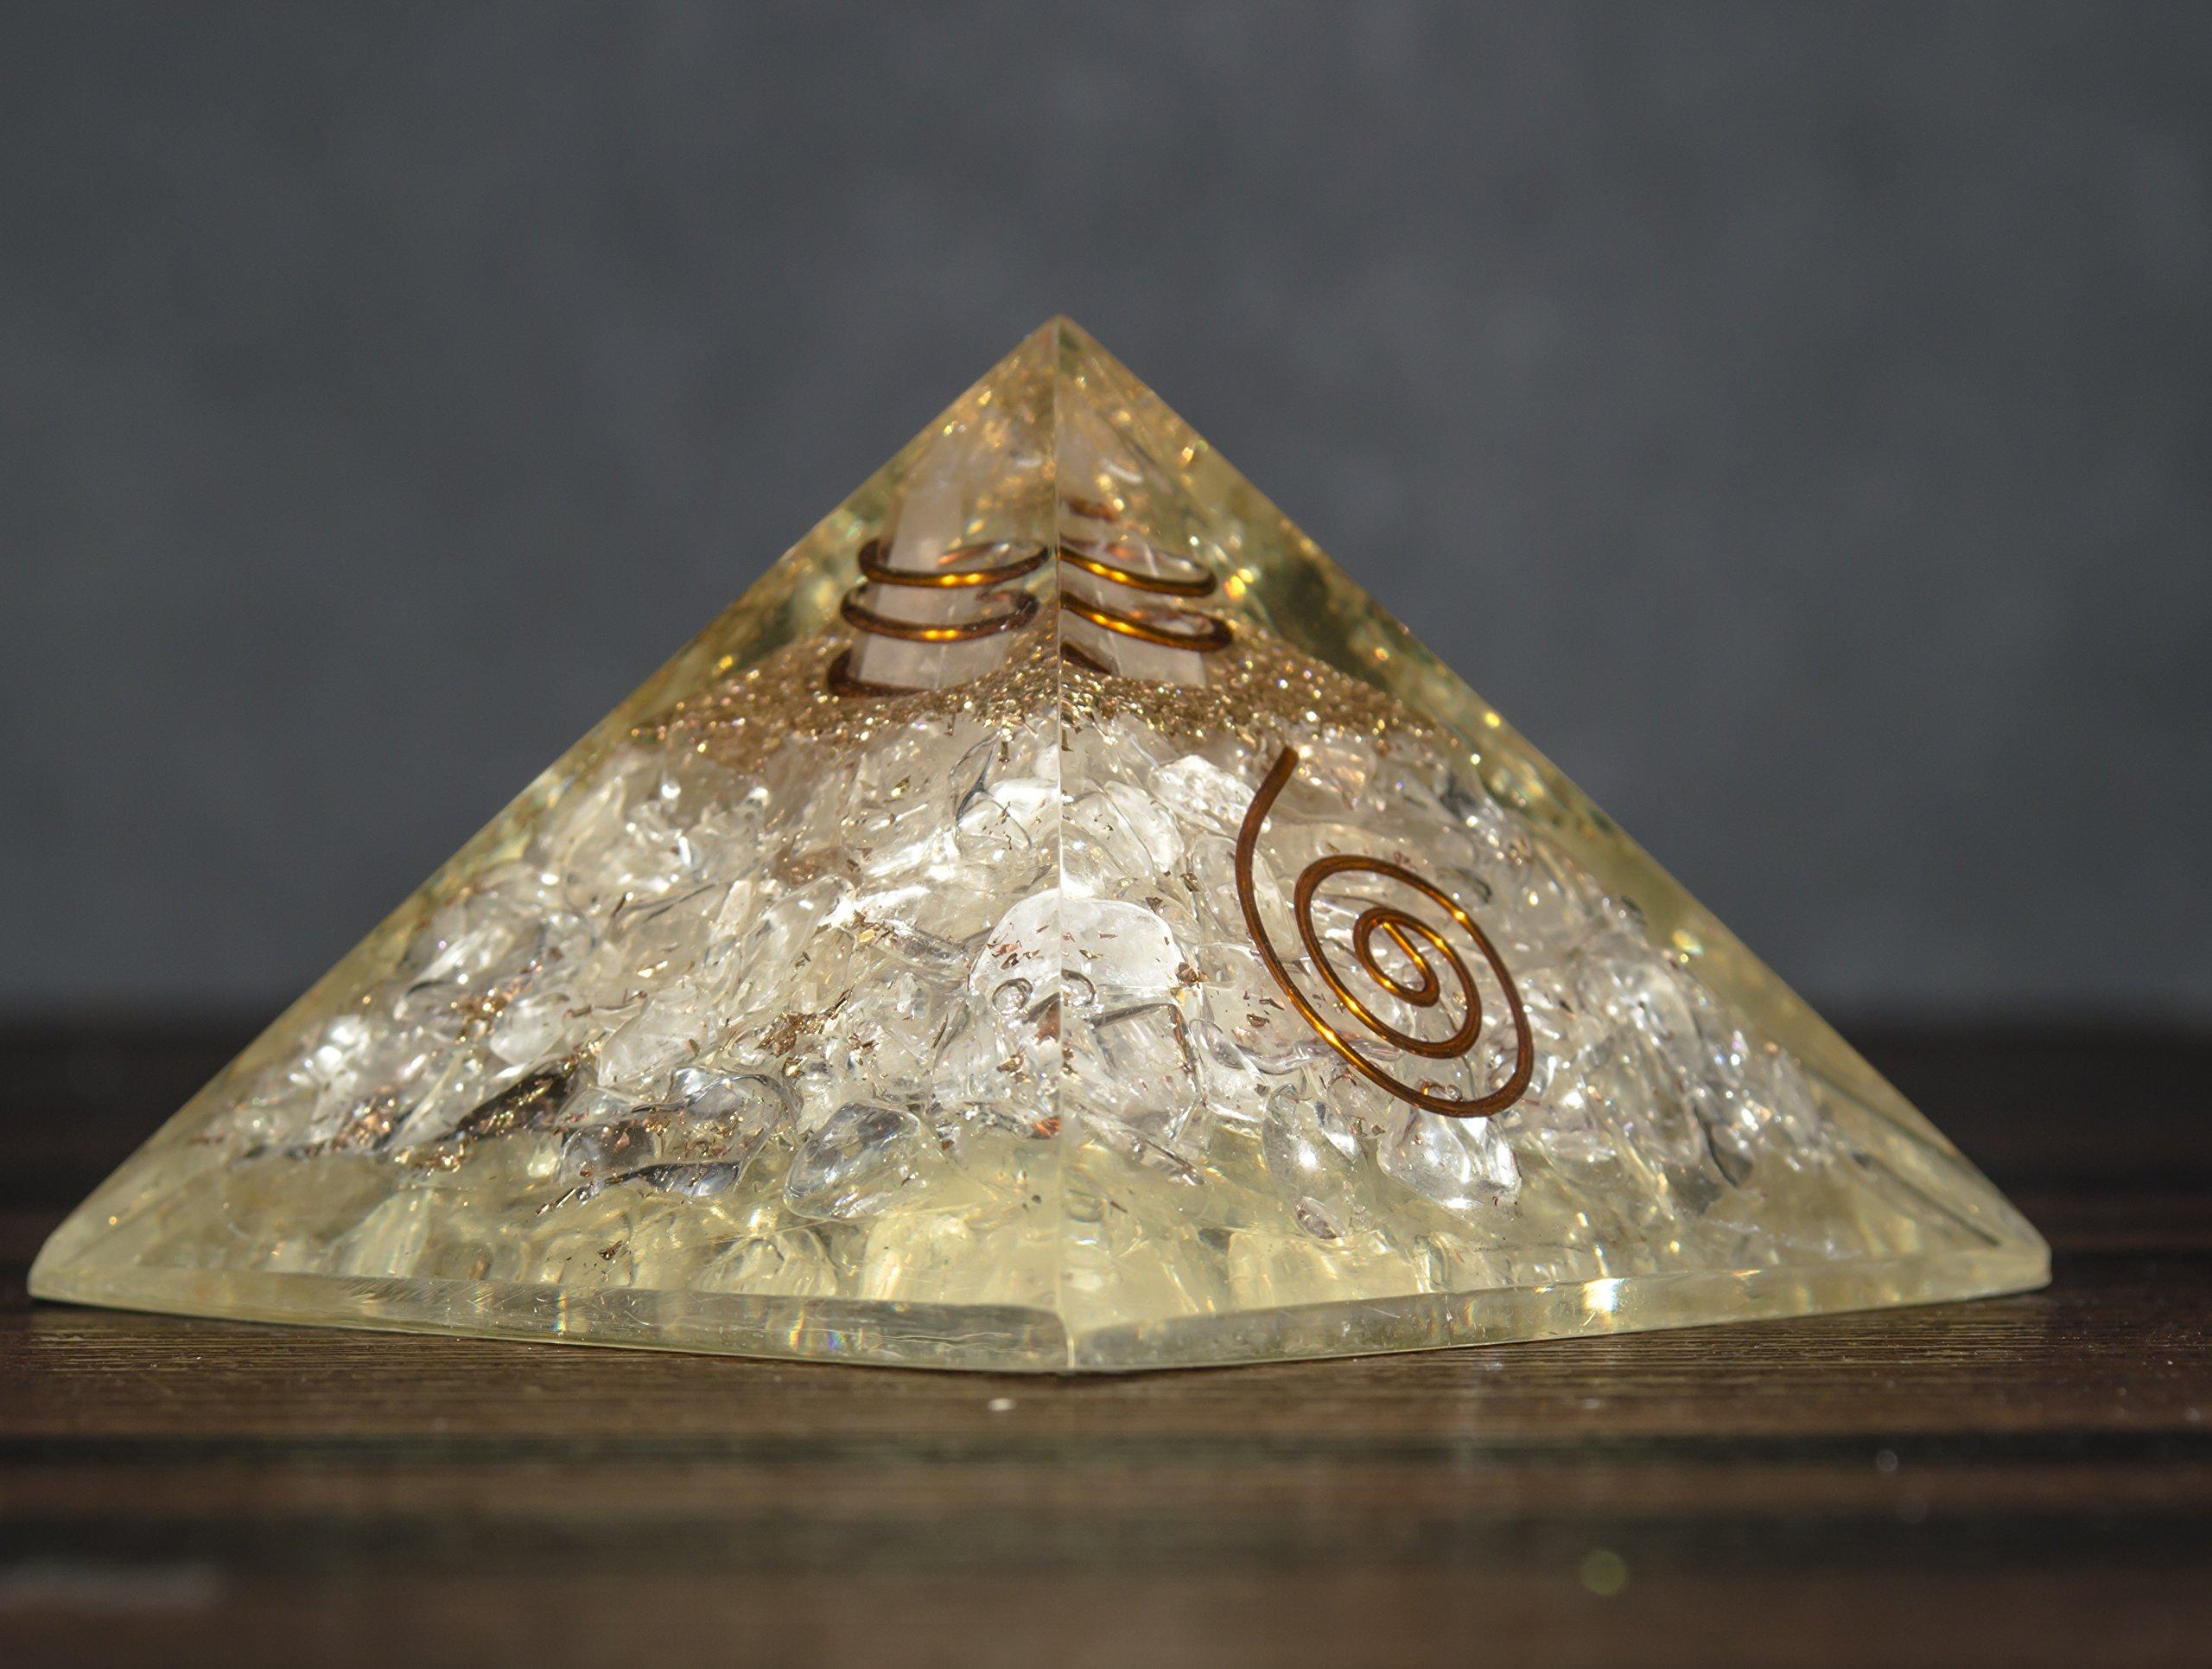 Crocon Clear Quartz Orgone Pyramid Gemstone Energy Generator For Reiki Healing Chakra Balancing EMF Protection Aura Cleansing Size: 2.5-3 Inch by Crocon (Image #3)